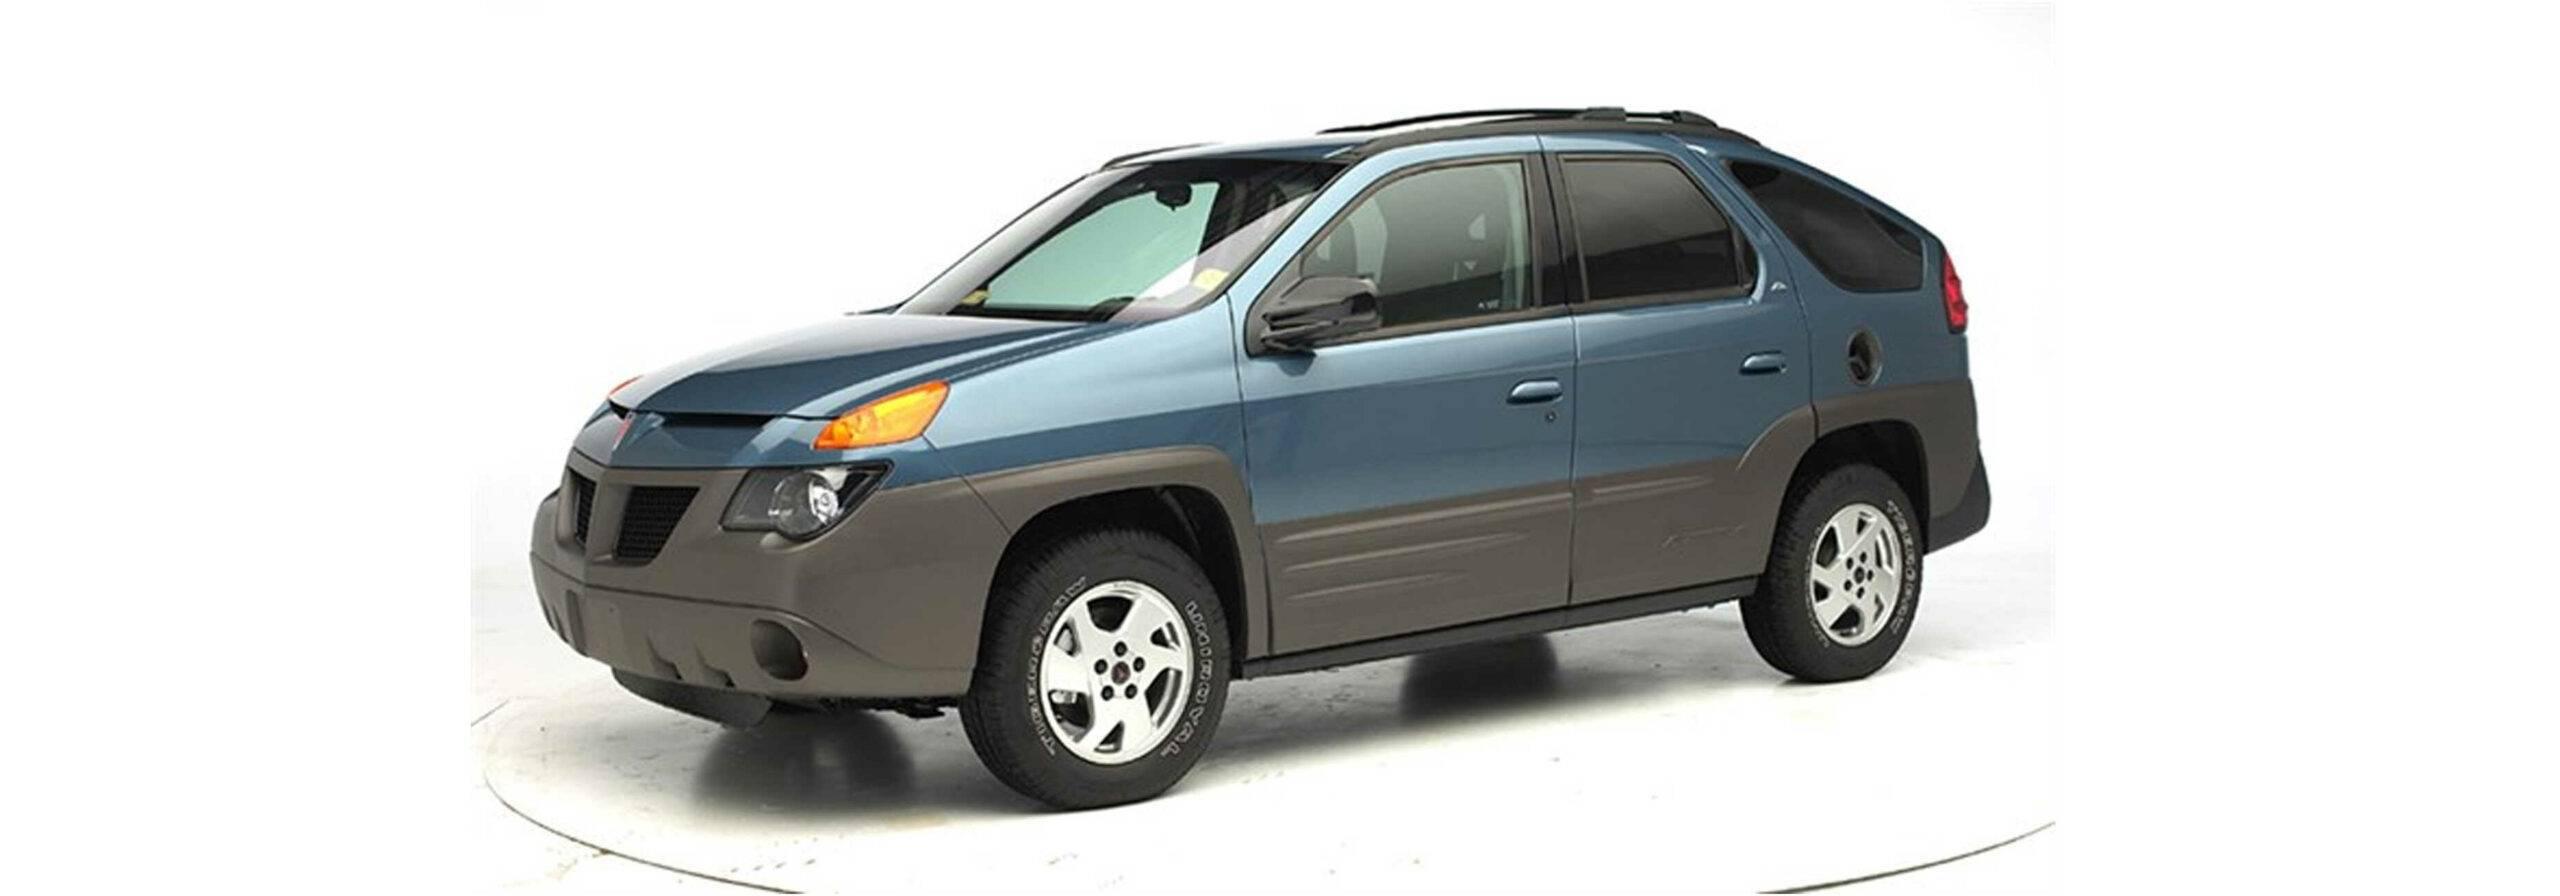 Pontiac's Aztek car